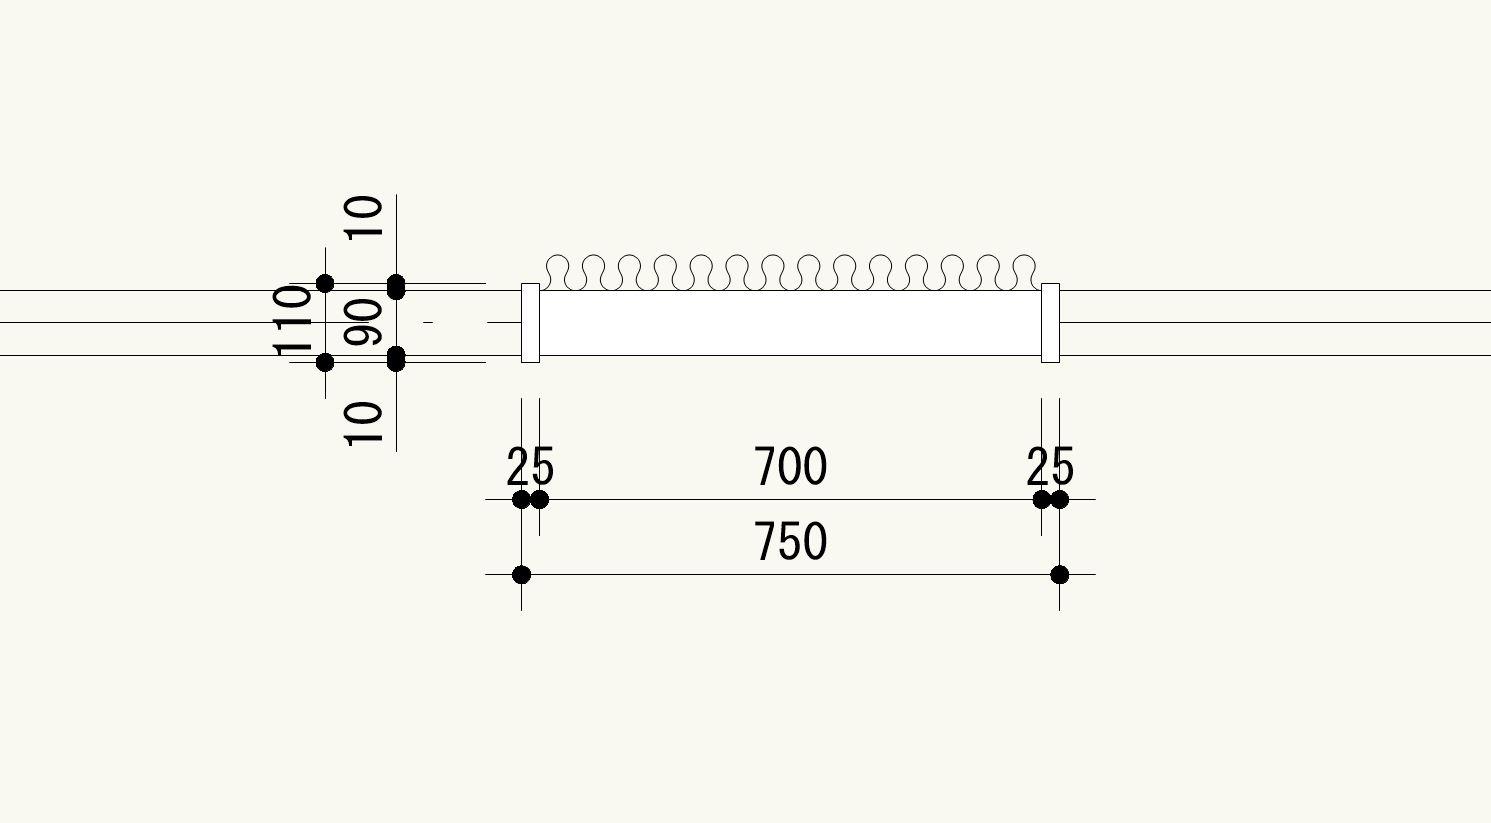 Vectorworksの断熱材ツールを使って簡単にカーテンを描く方法